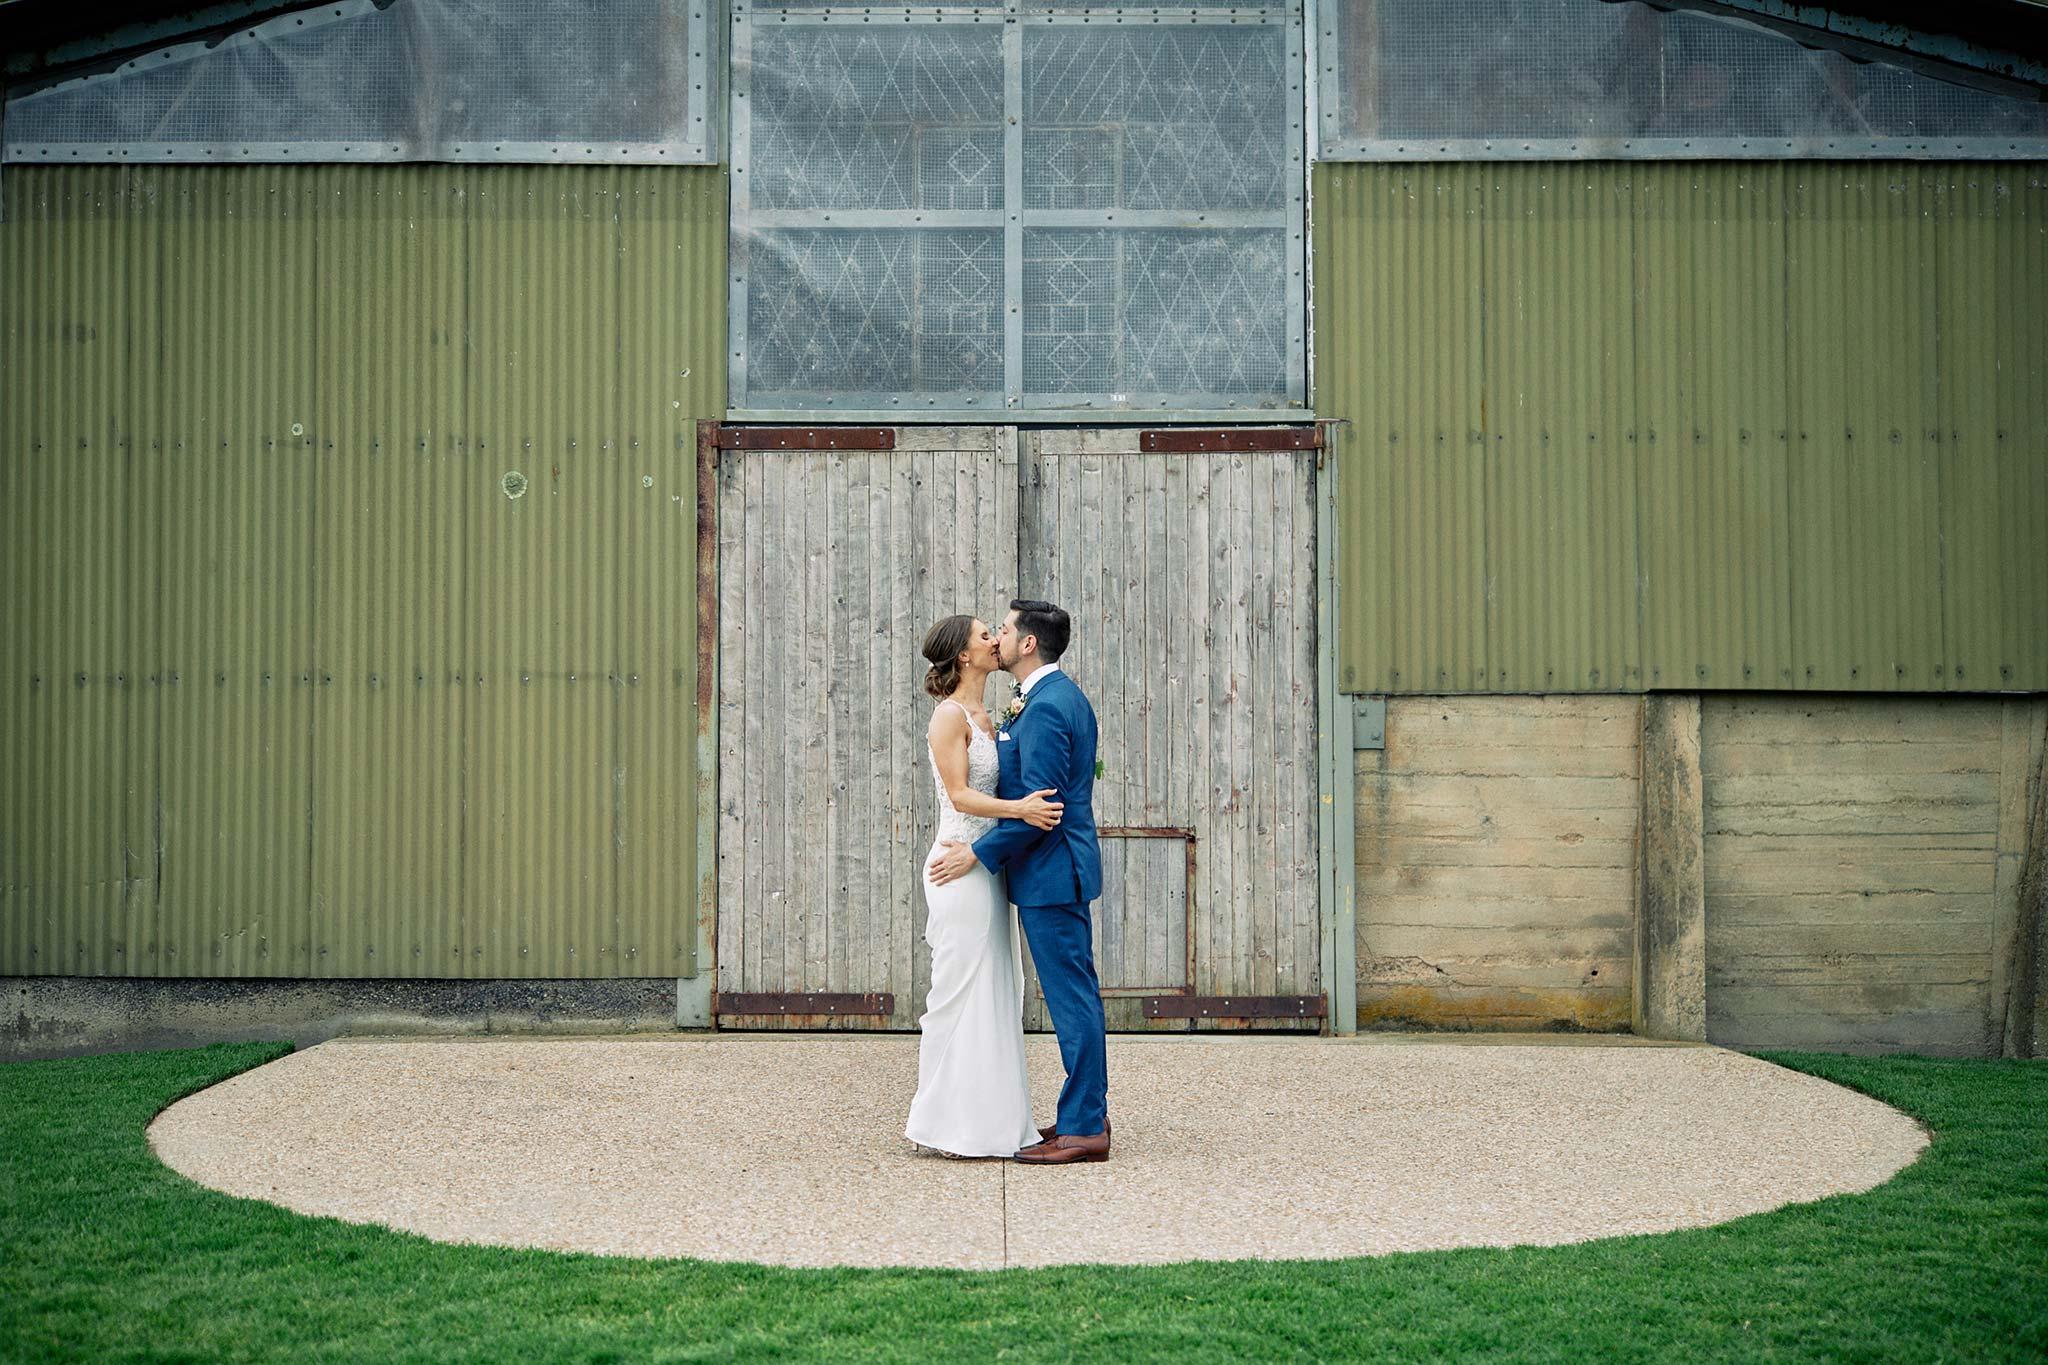 Zonzo estate wedding bride groom first look